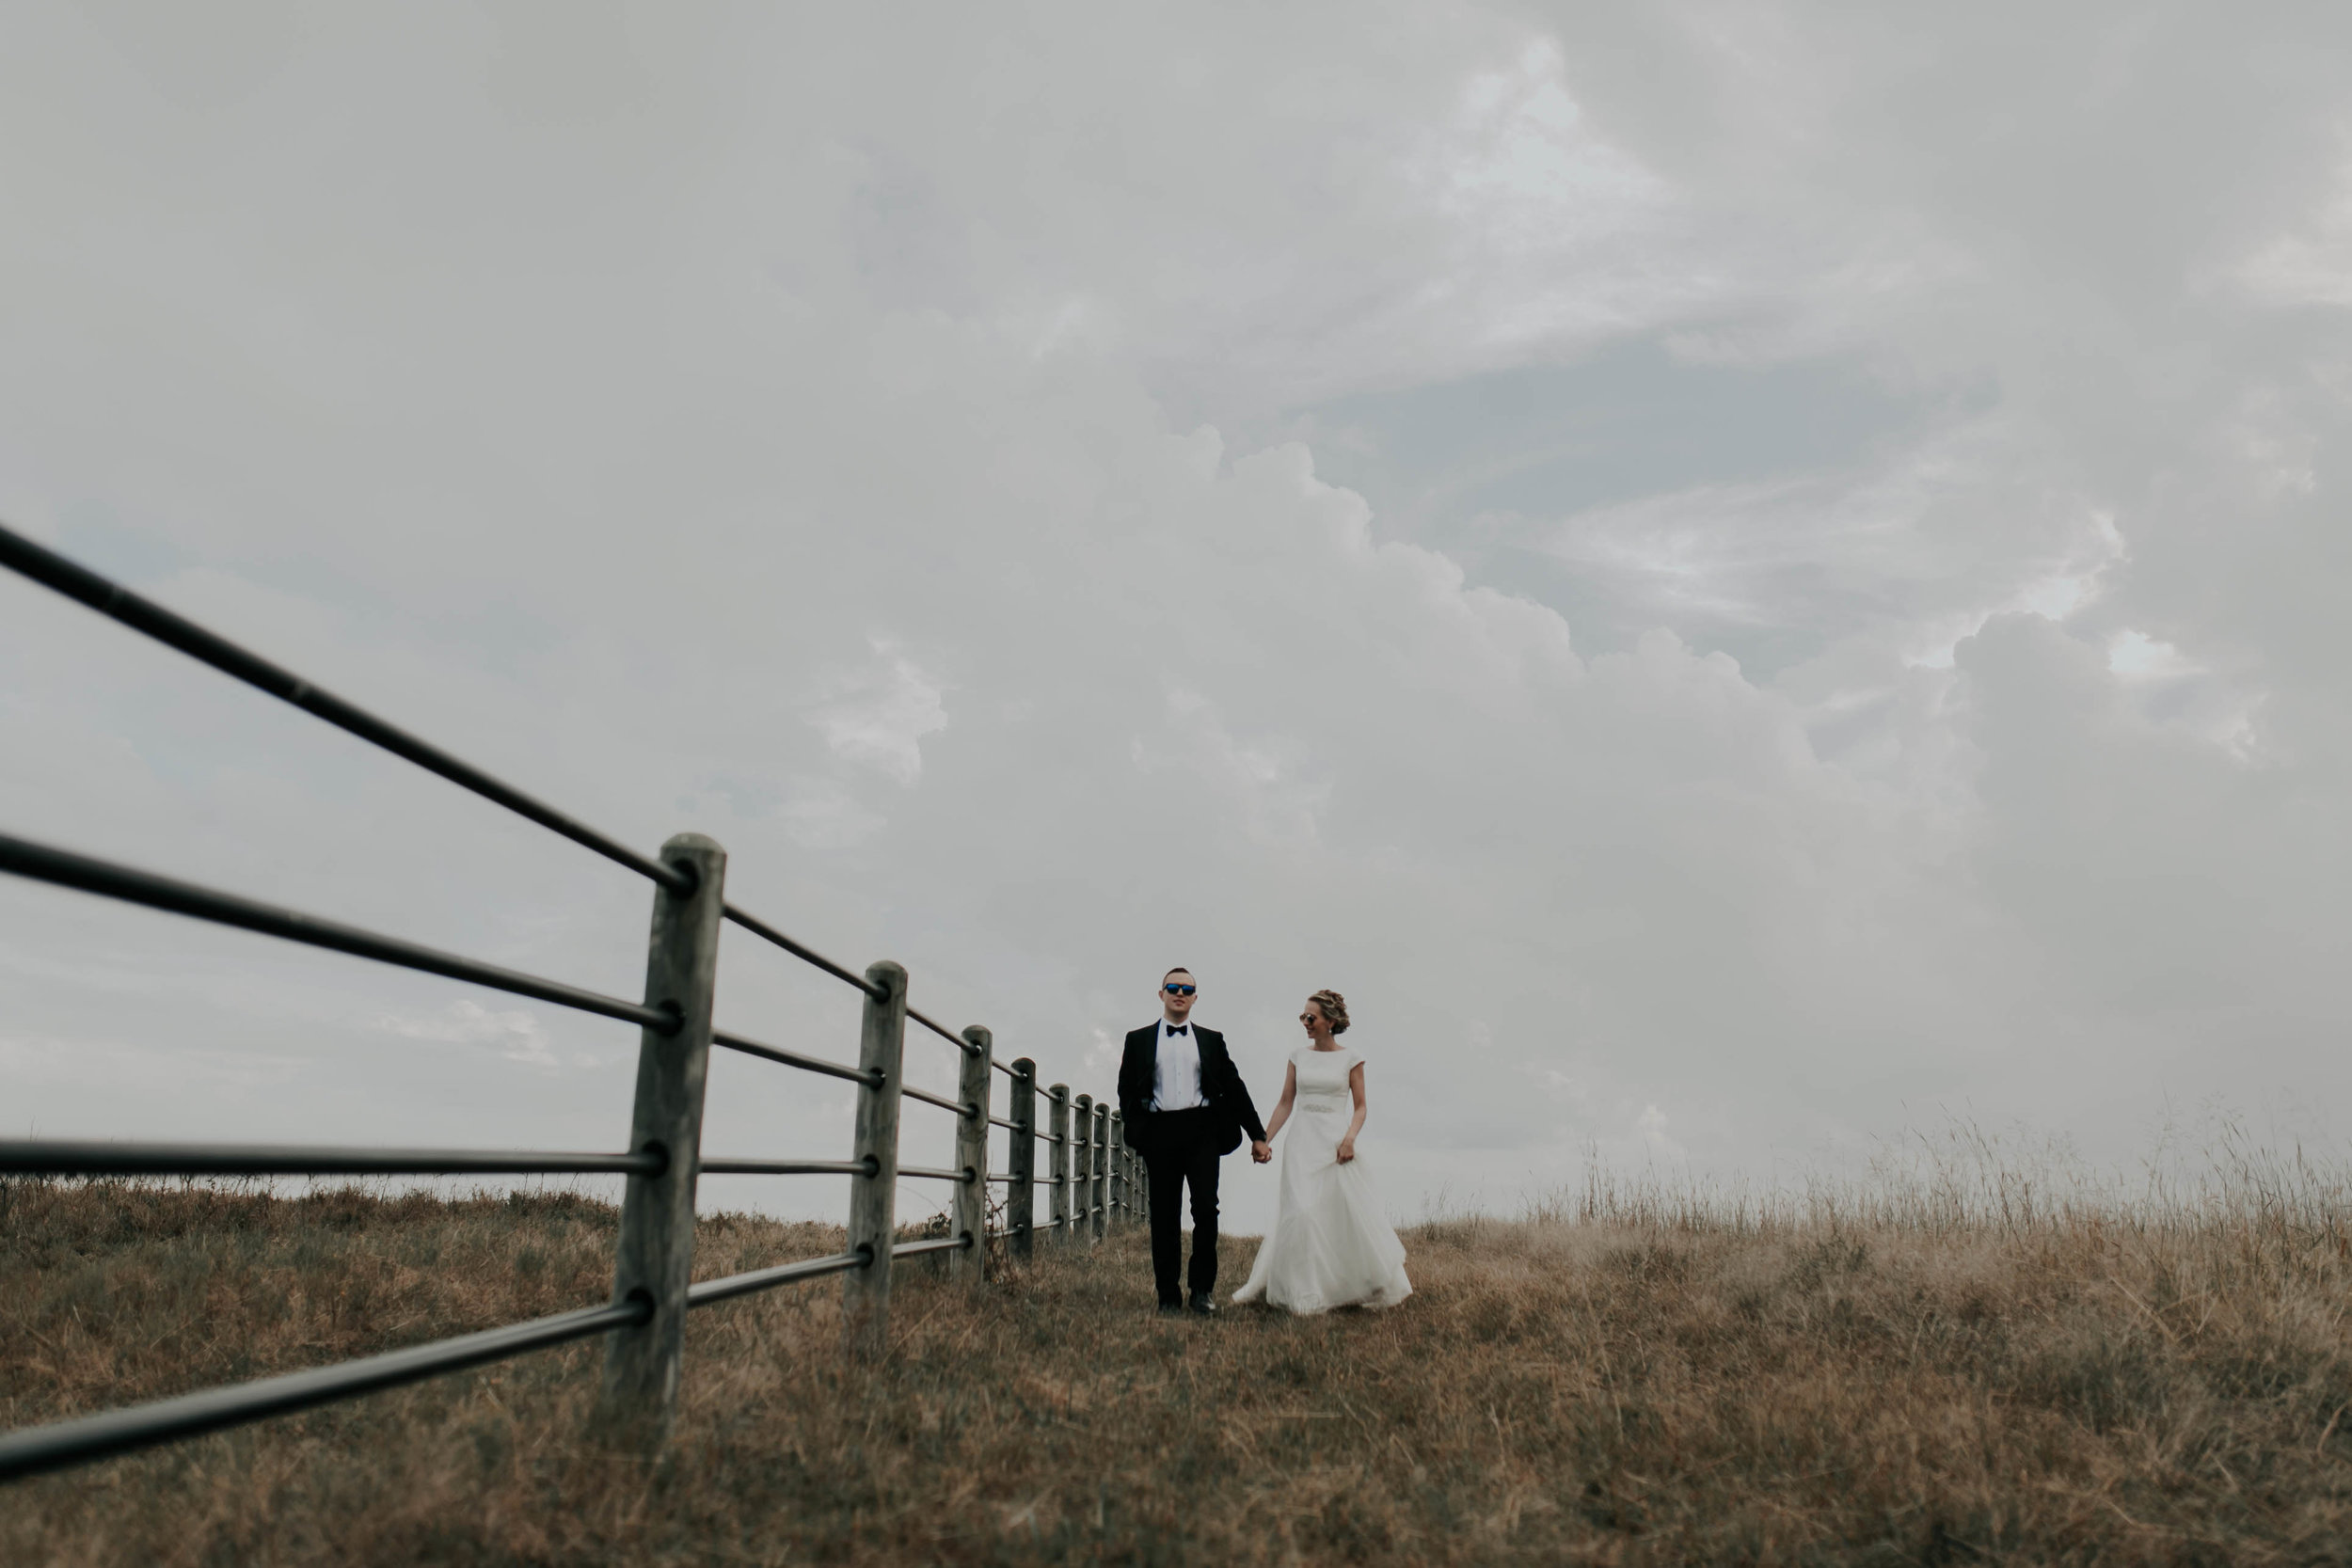 10.06.18ClayEmilyWedding-BrideGroom-1715.jpg